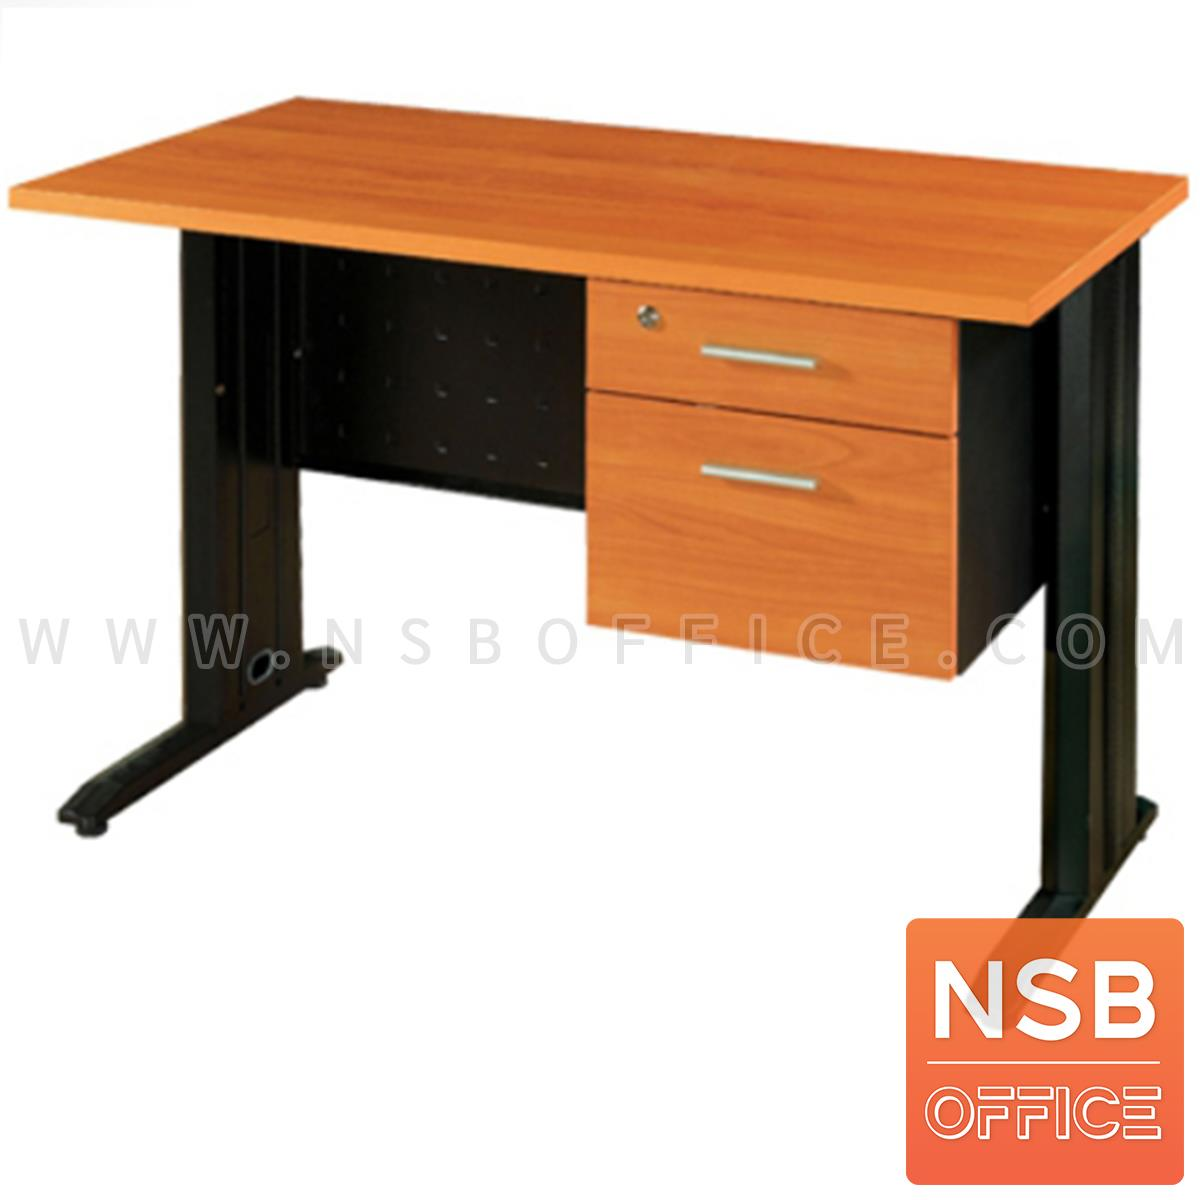 A10A003:โต๊ะทำงาน 2 ลิ้นชัก 120W*75H cm.  รุ่น S-DK-2021   ขาเหล็กตัวแอลสีดำ